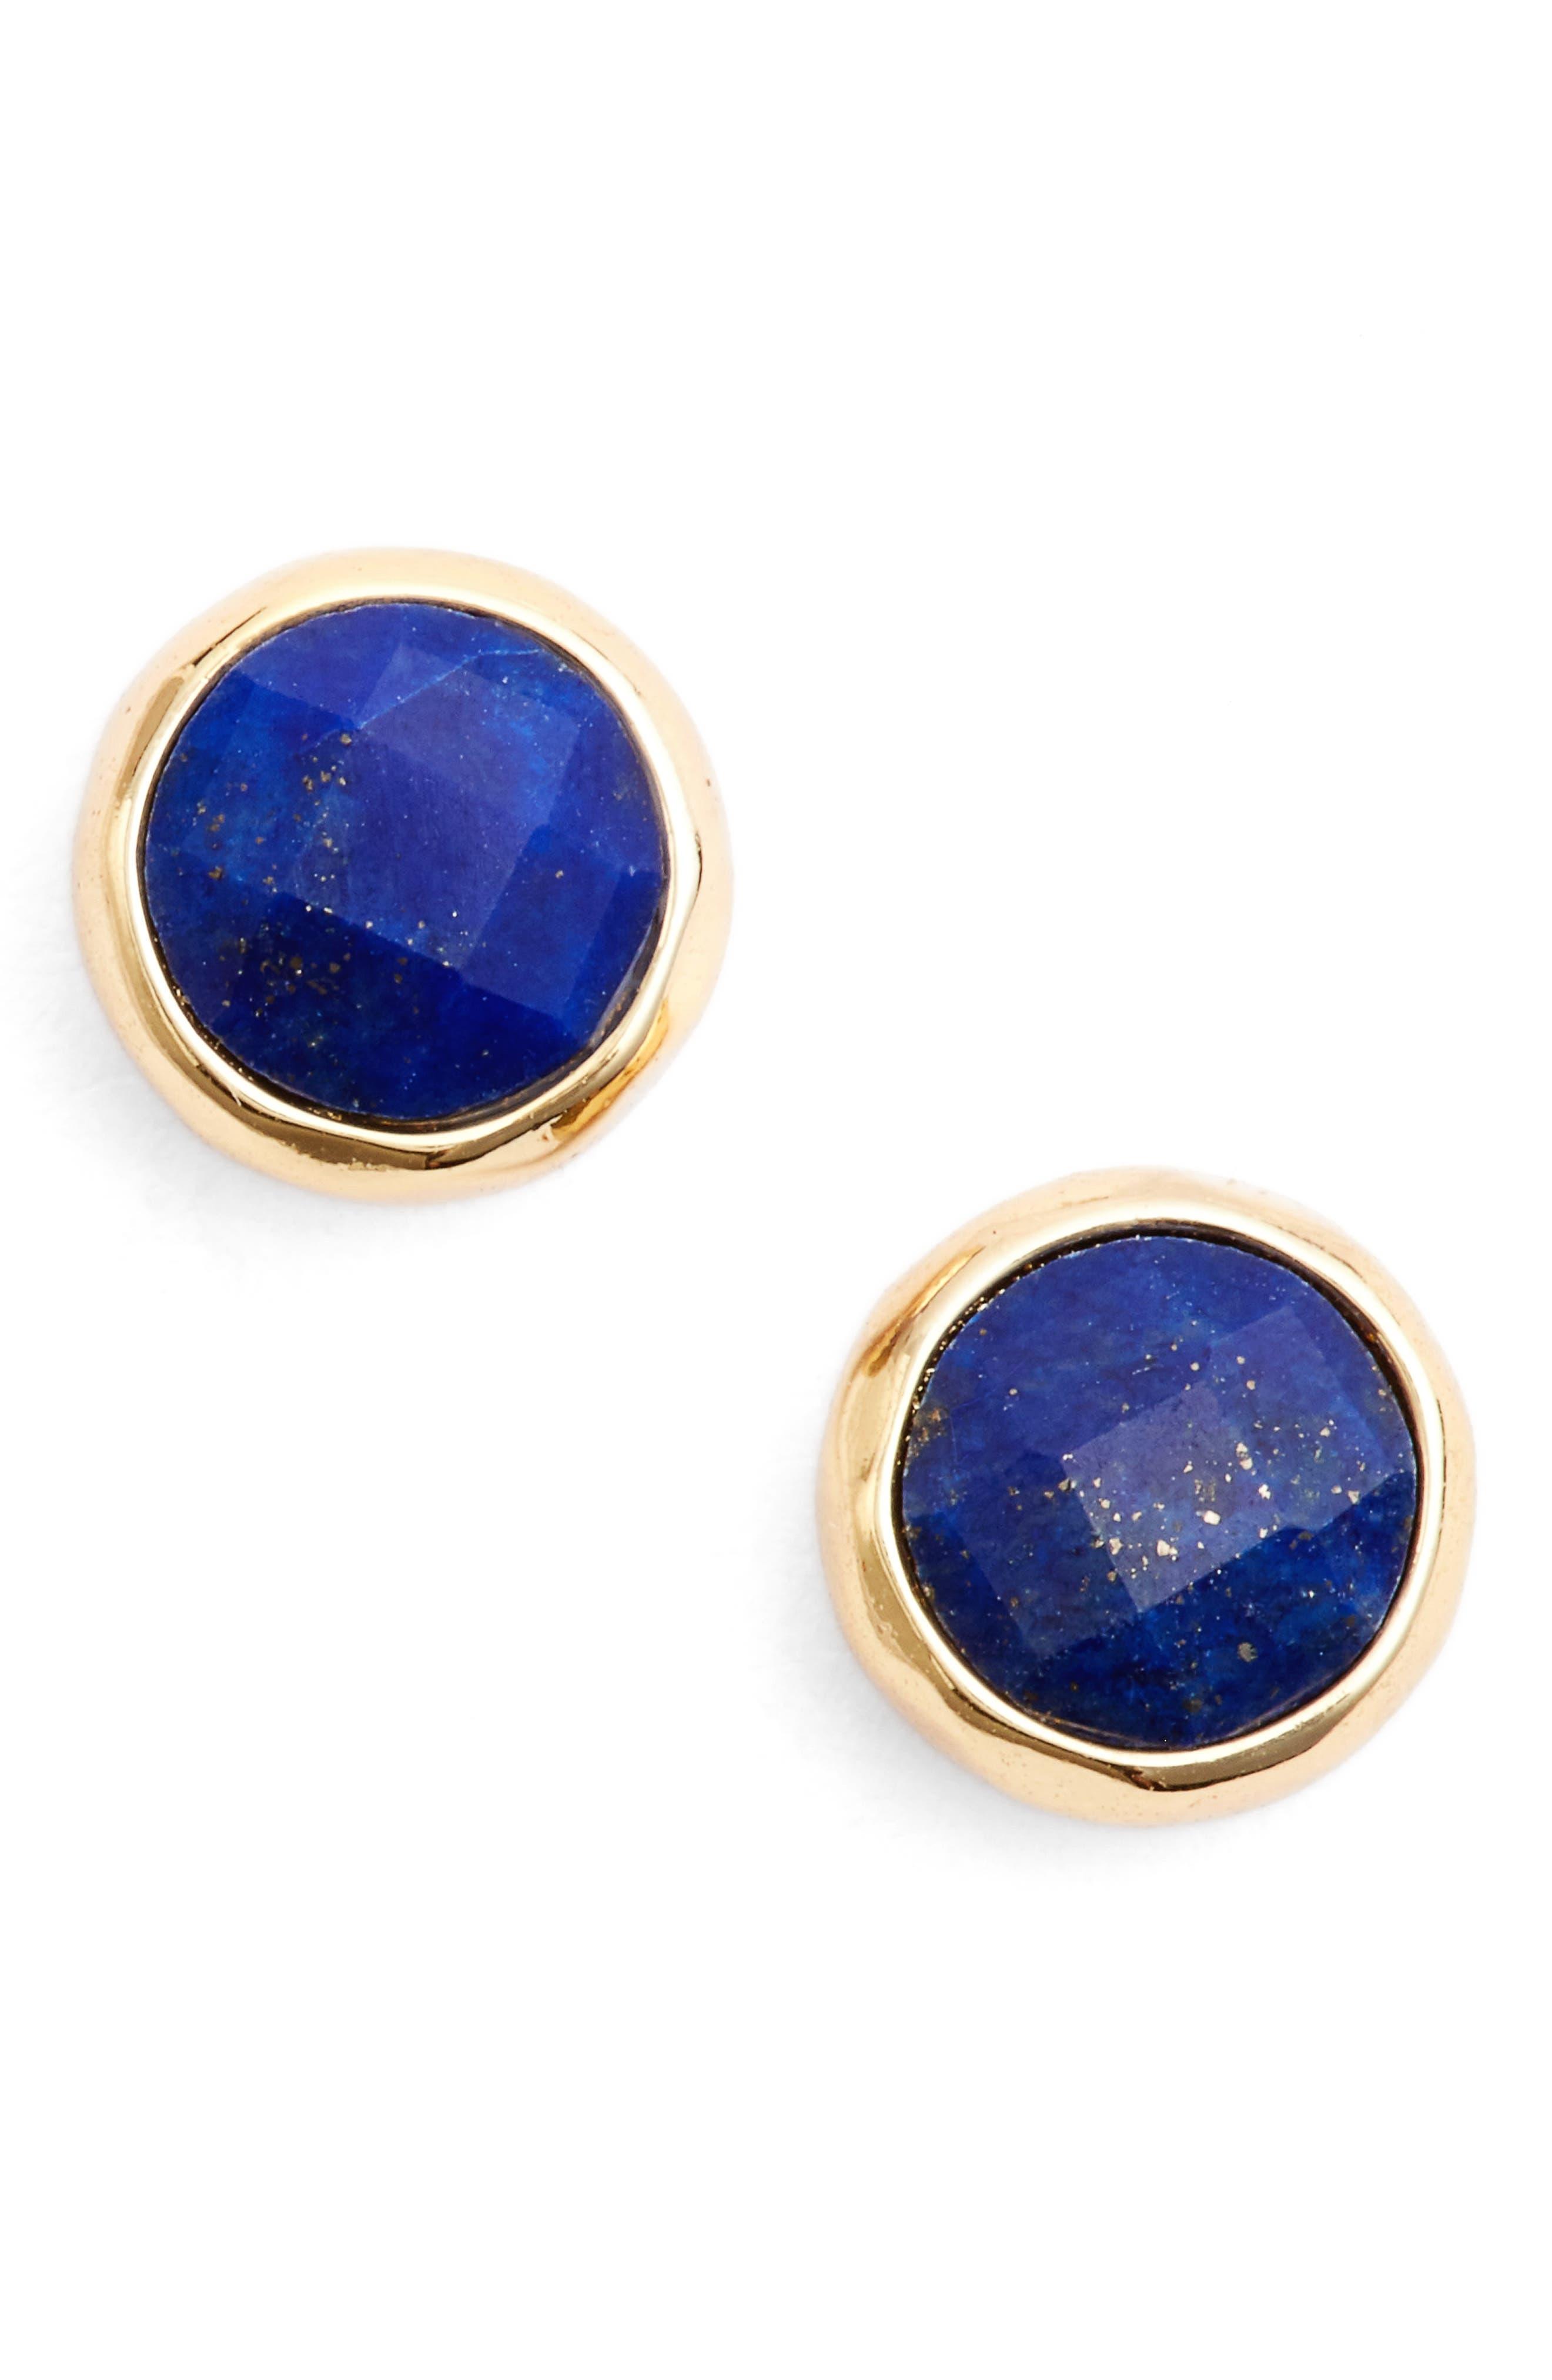 Wisdom Stud Earrings,                         Main,                         color, LAPIS/ GOLD